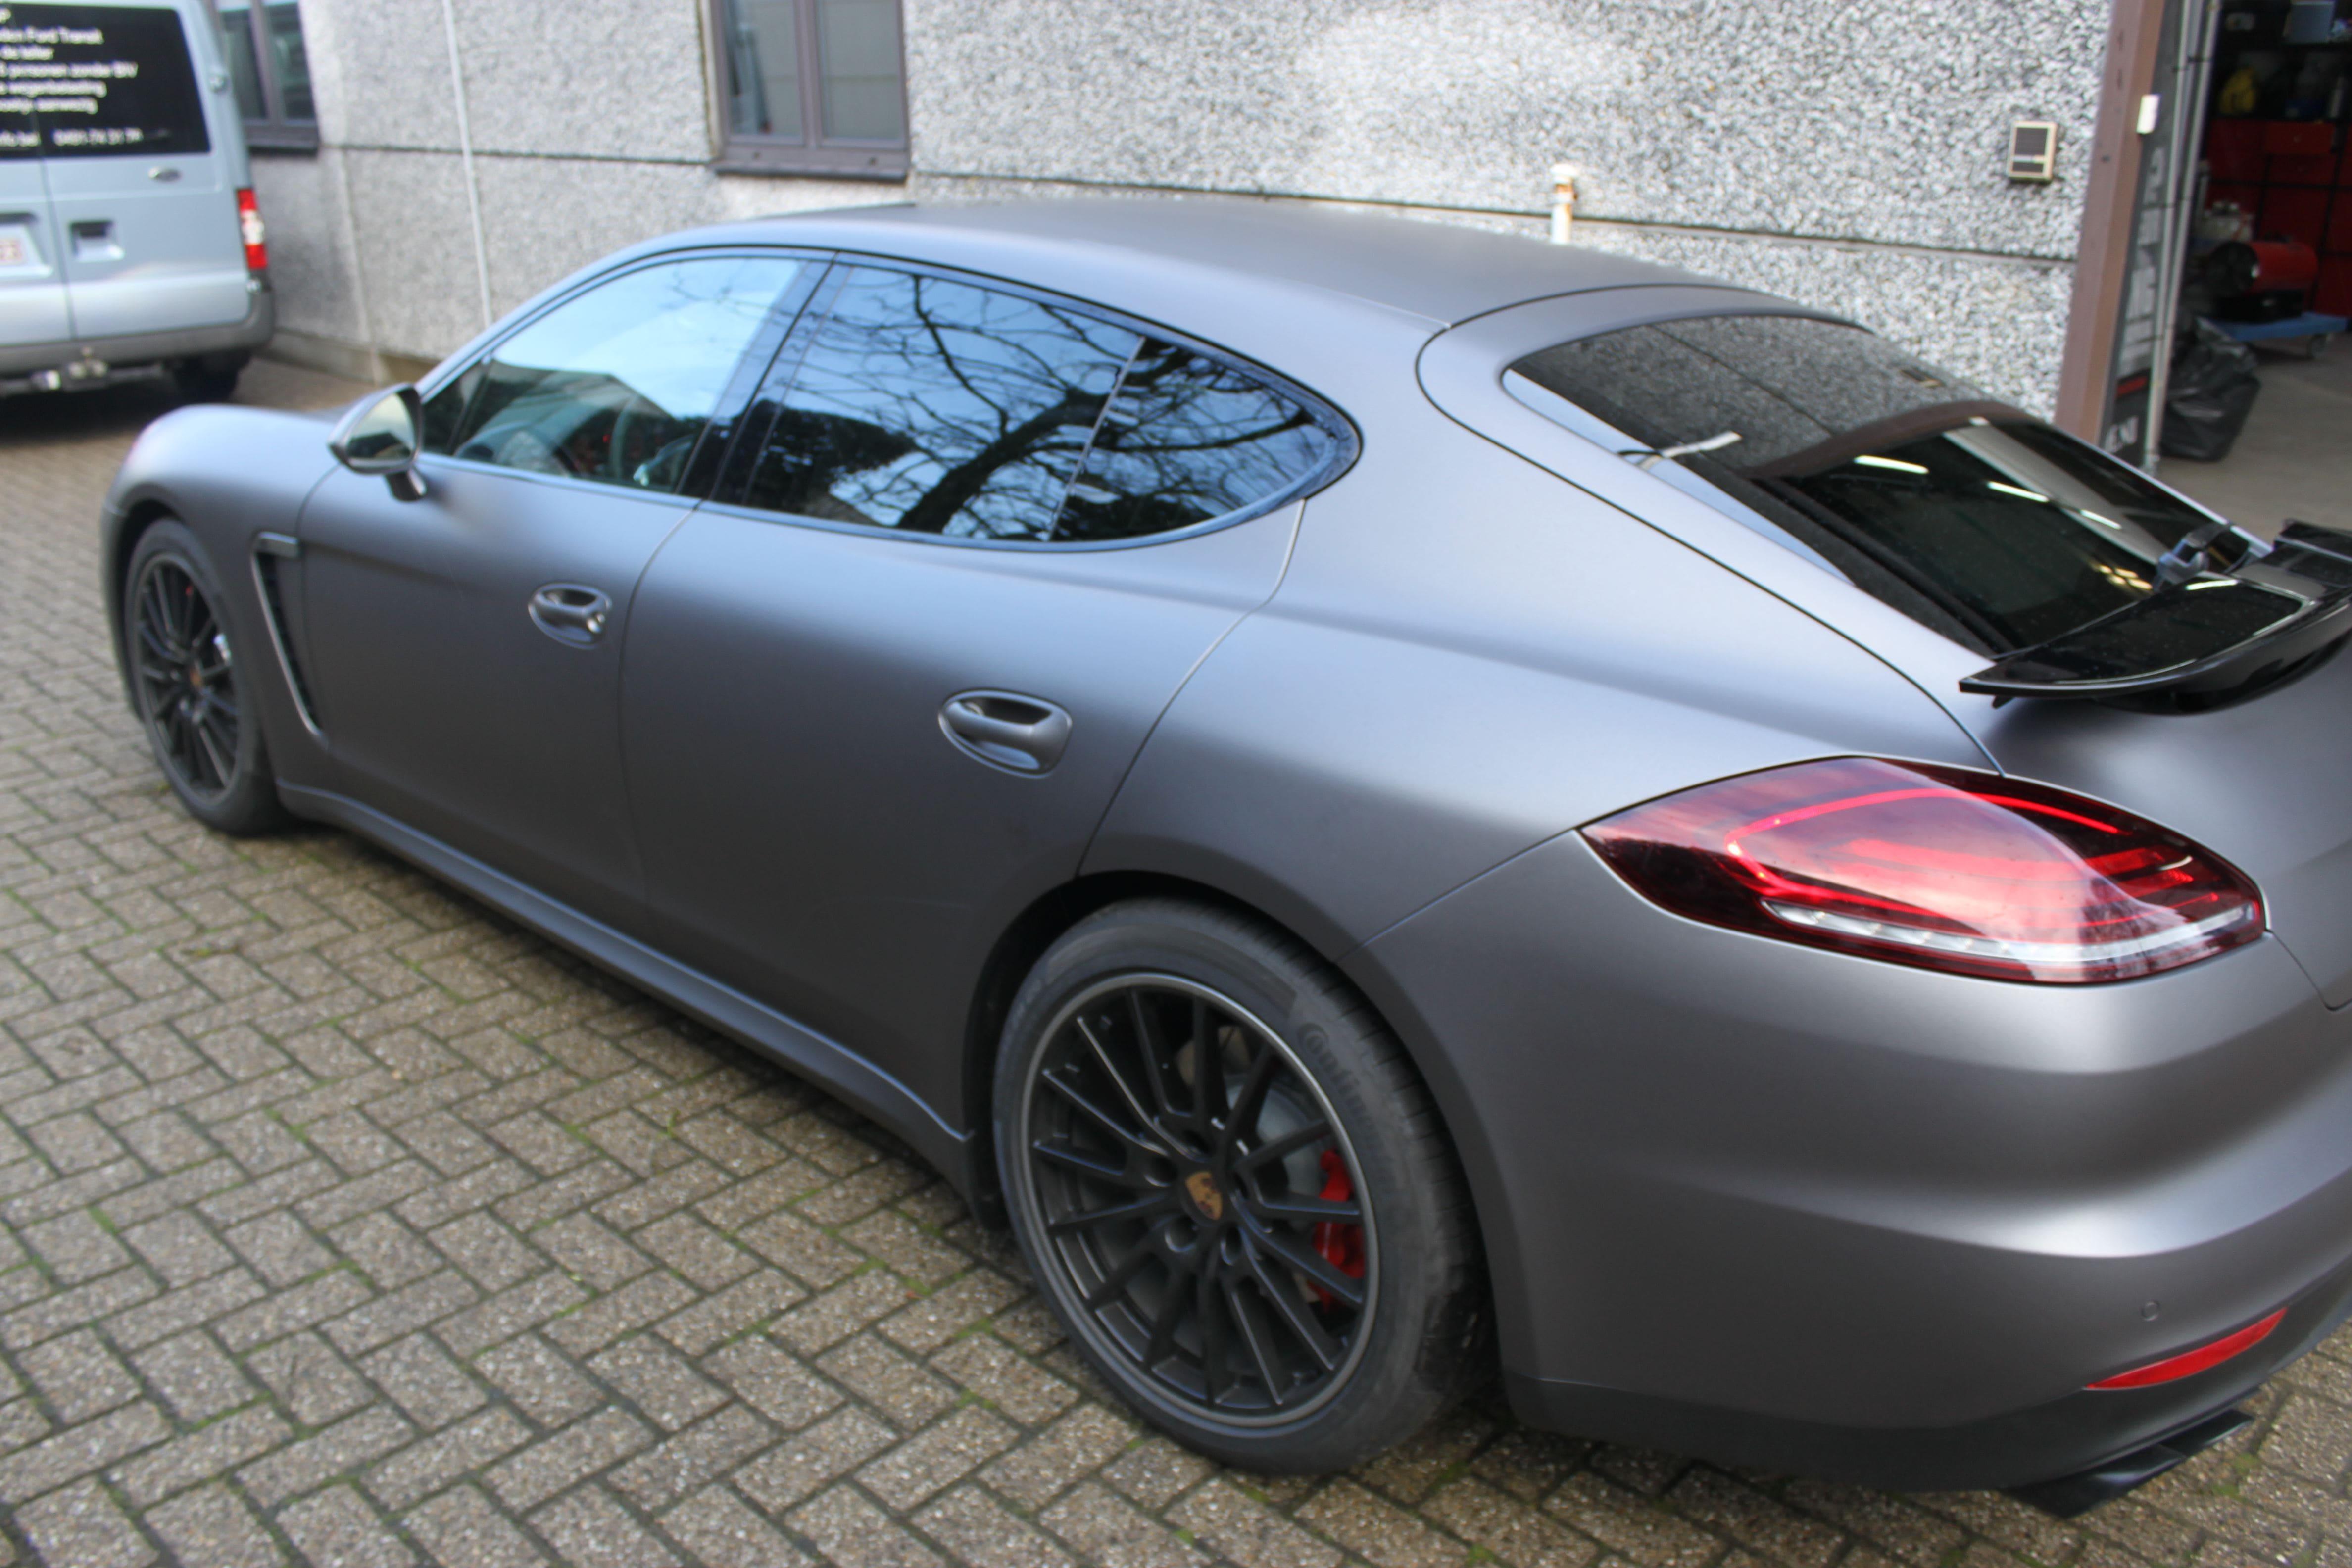 Porsche Panamera GTS Full Wrap in Gunpowder, Carwrapping door Wrapmyride.nu Foto-nr:7122, ©2021